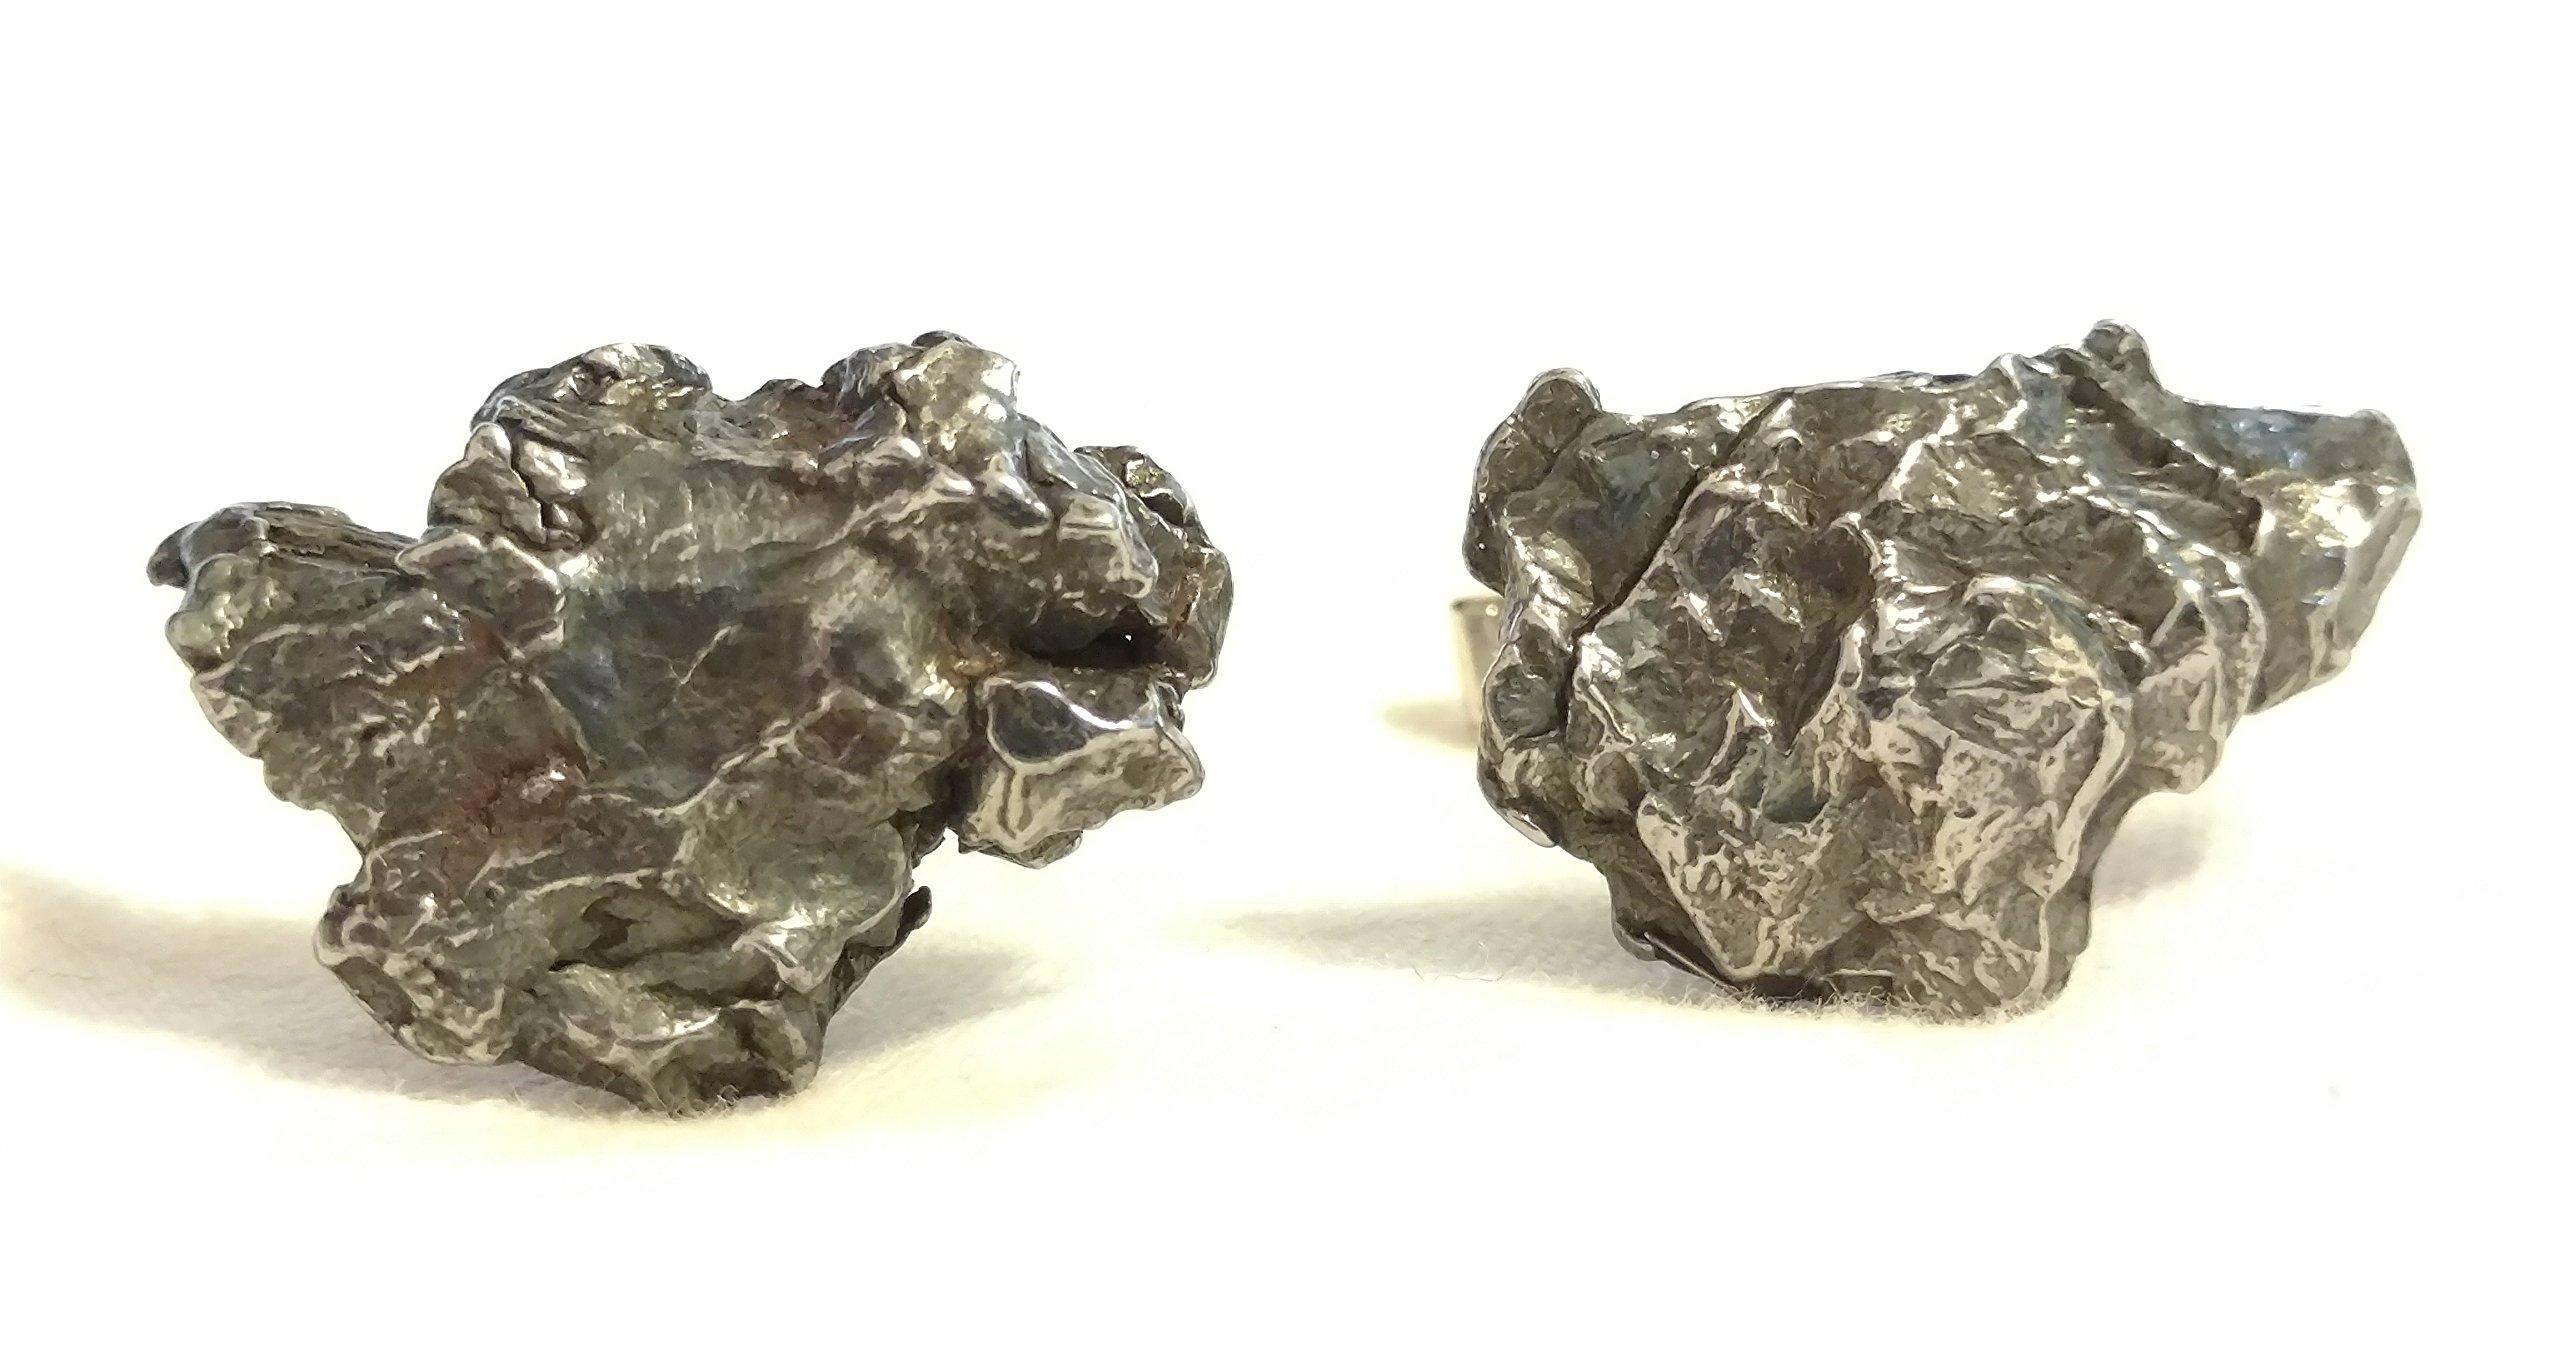 METEORITE Cufflinks, Sterling Silver & Campo Del Cielo Meteorite Fragments (B)